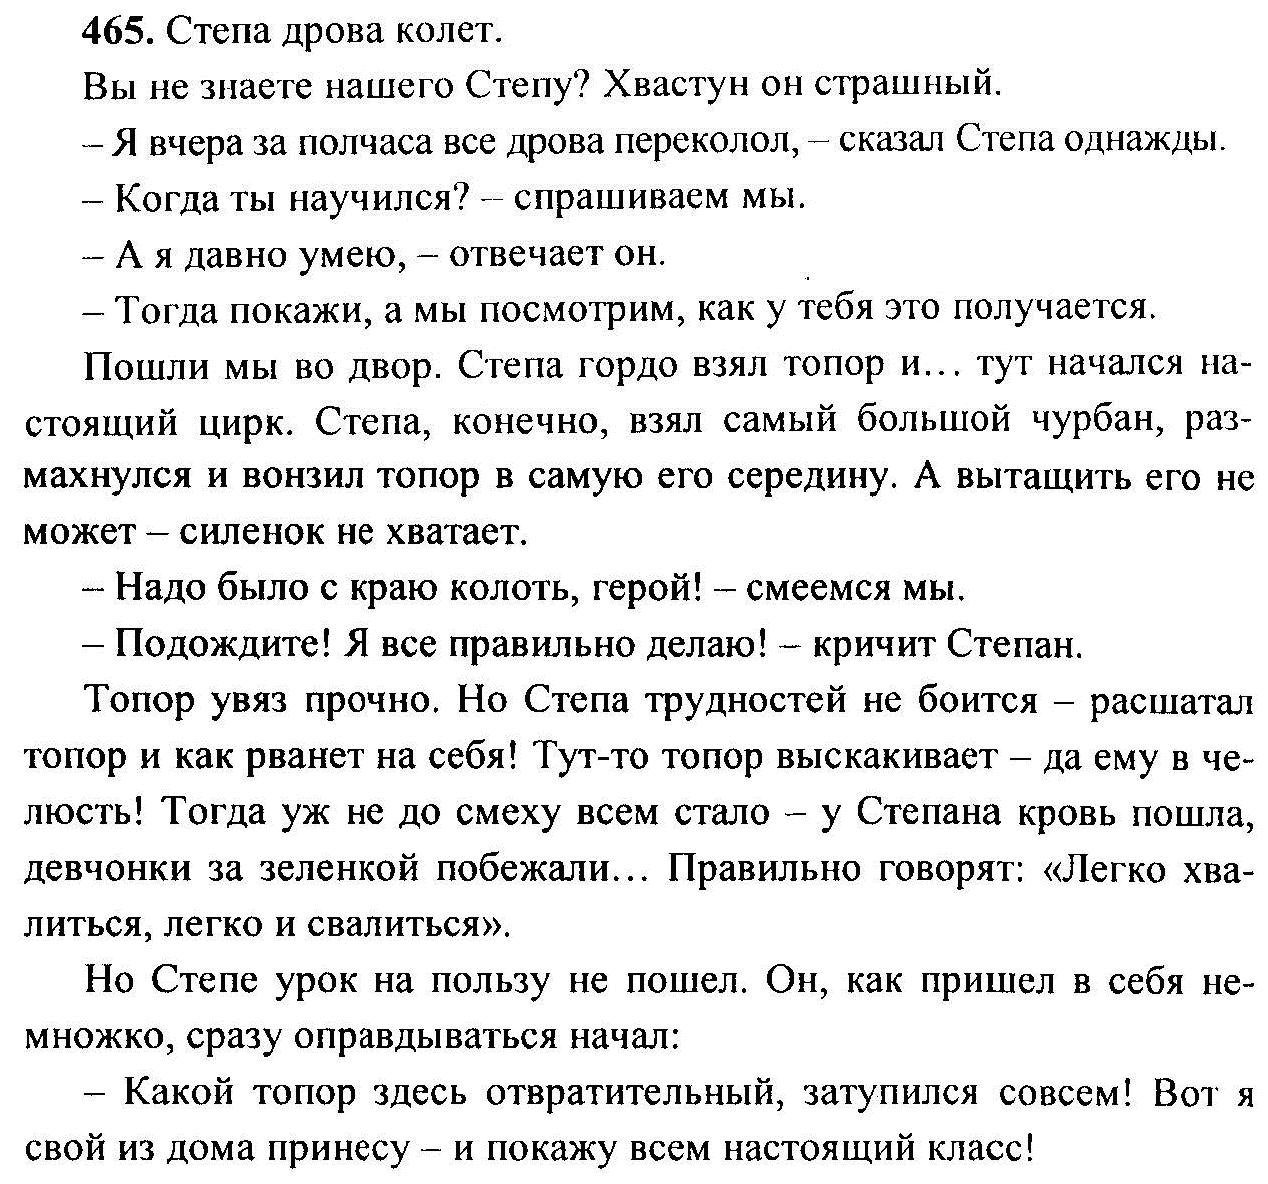 гдз по русскому языку 6 класс ладыженская 465